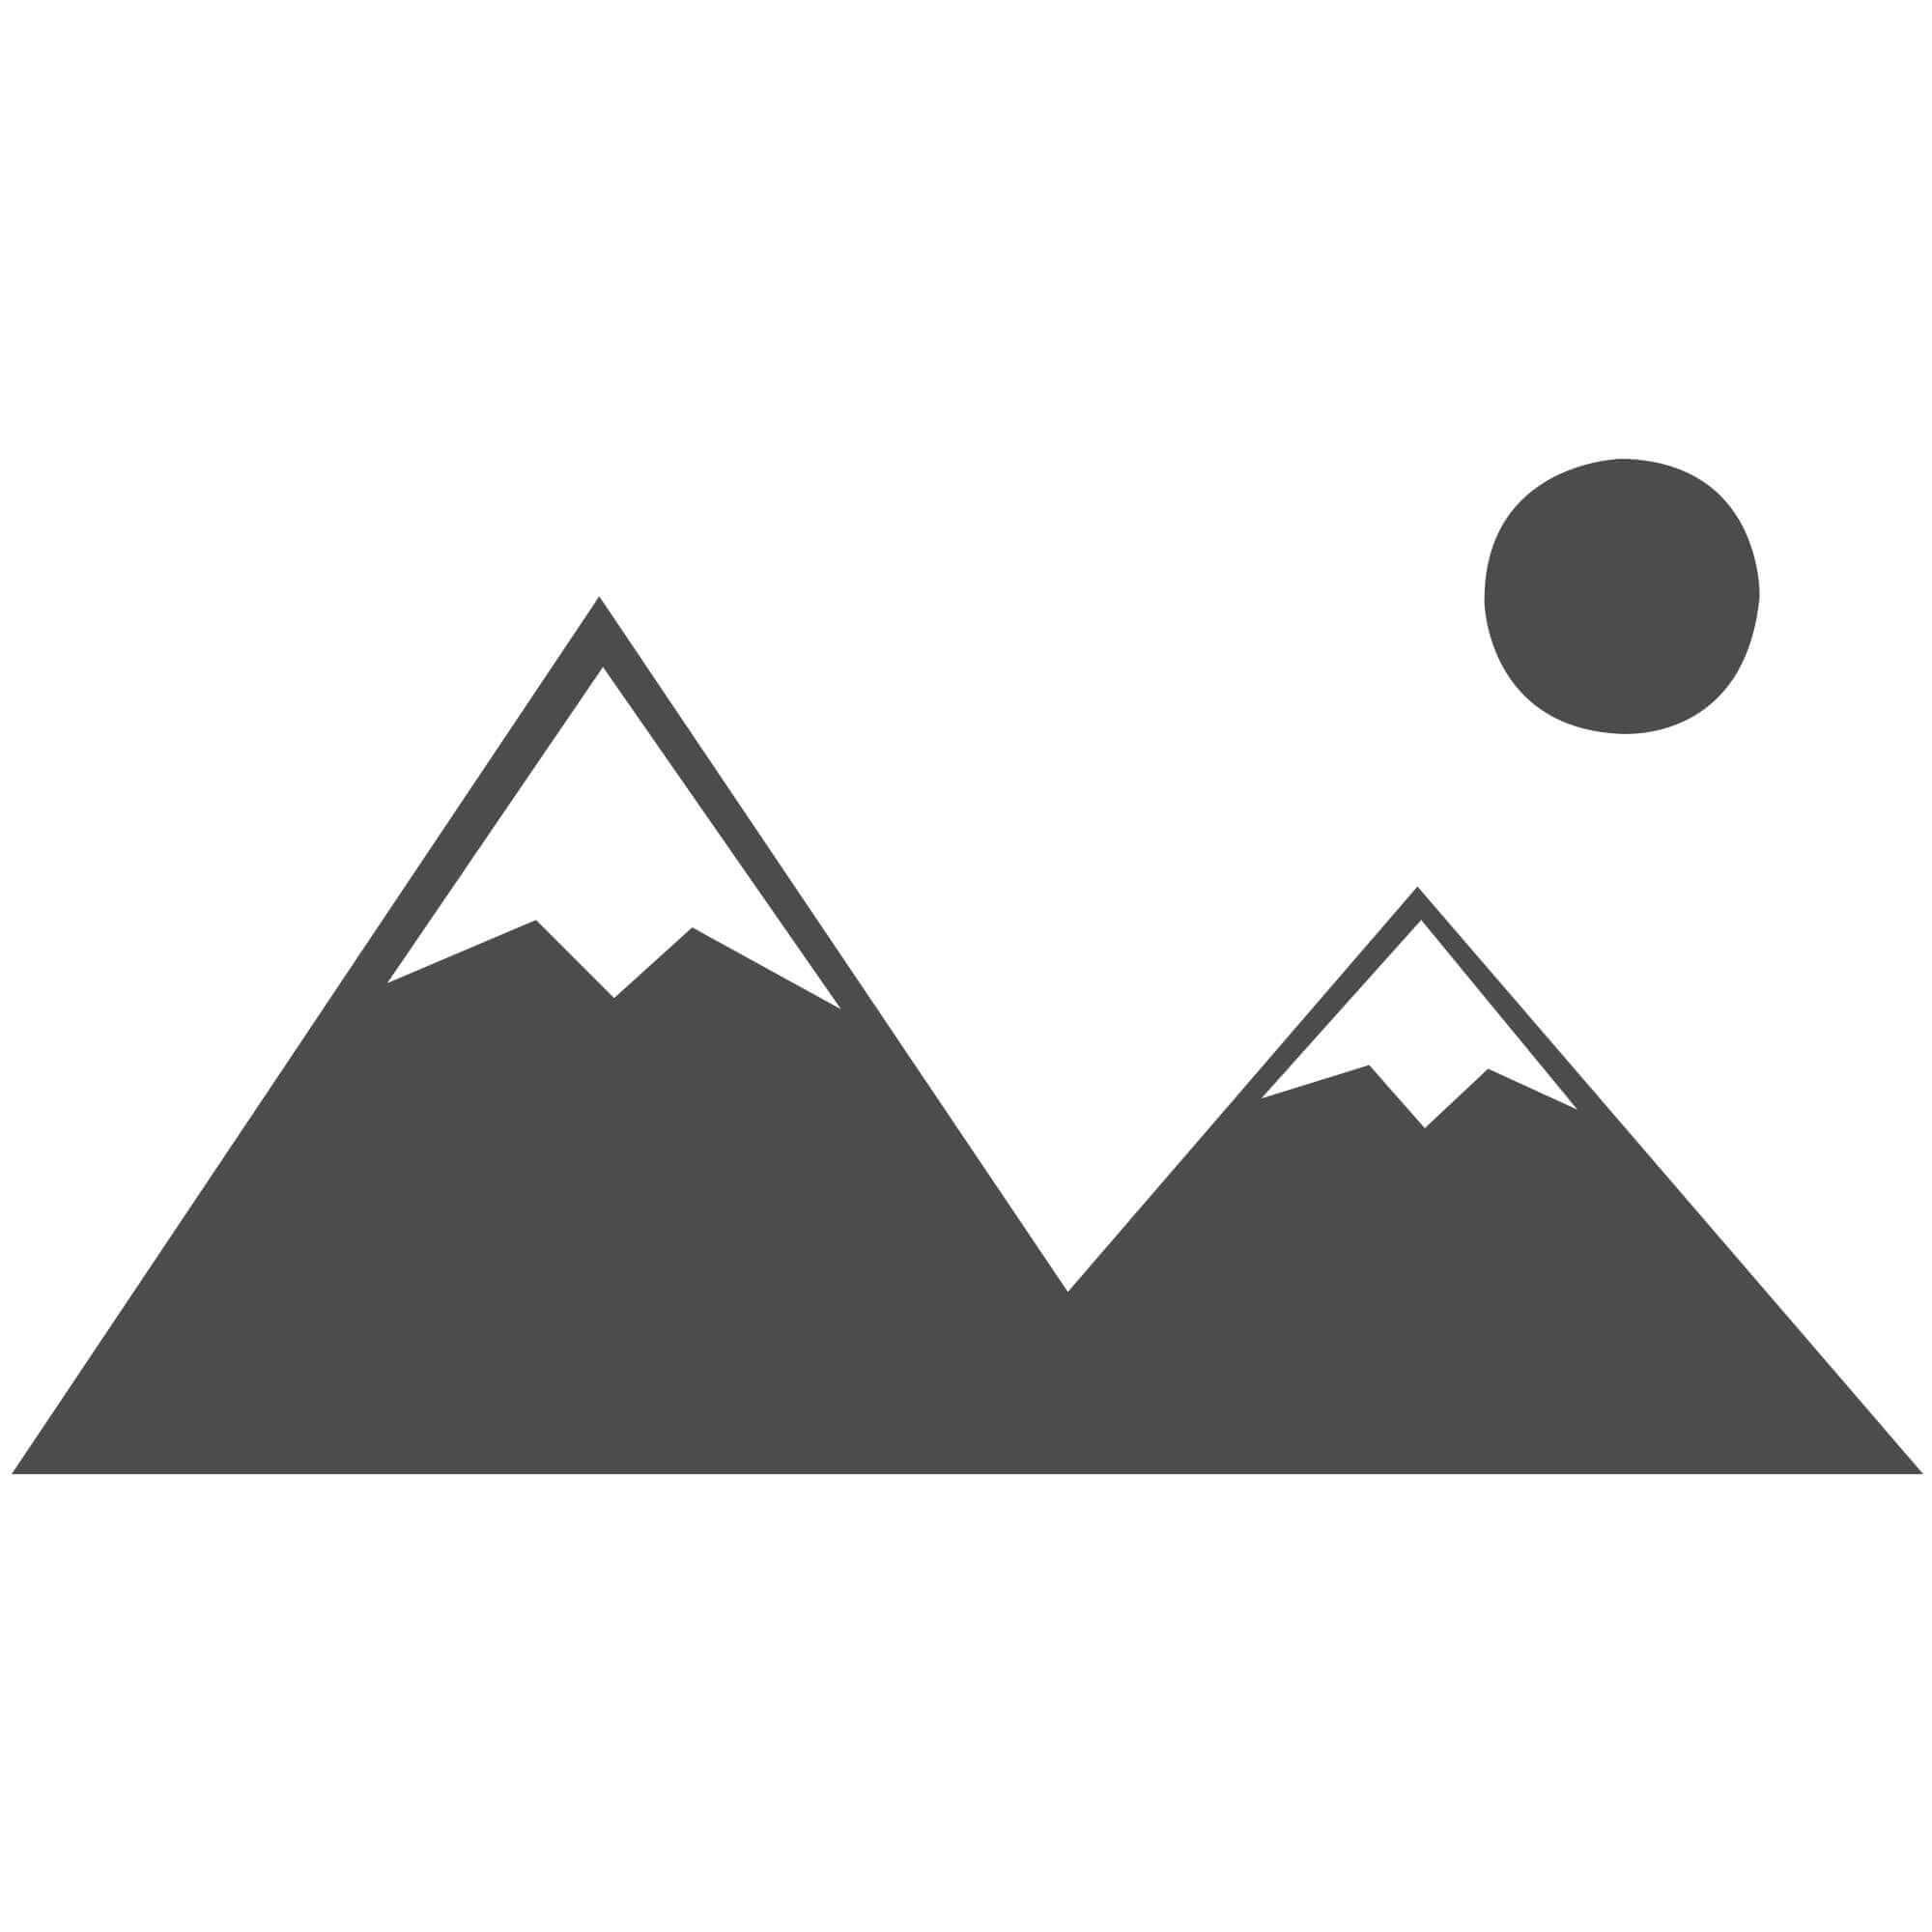 "Nordic Cariboo Shaggy Rug - Beige - Size 60 x 110 cm (2' x 3'7"")"